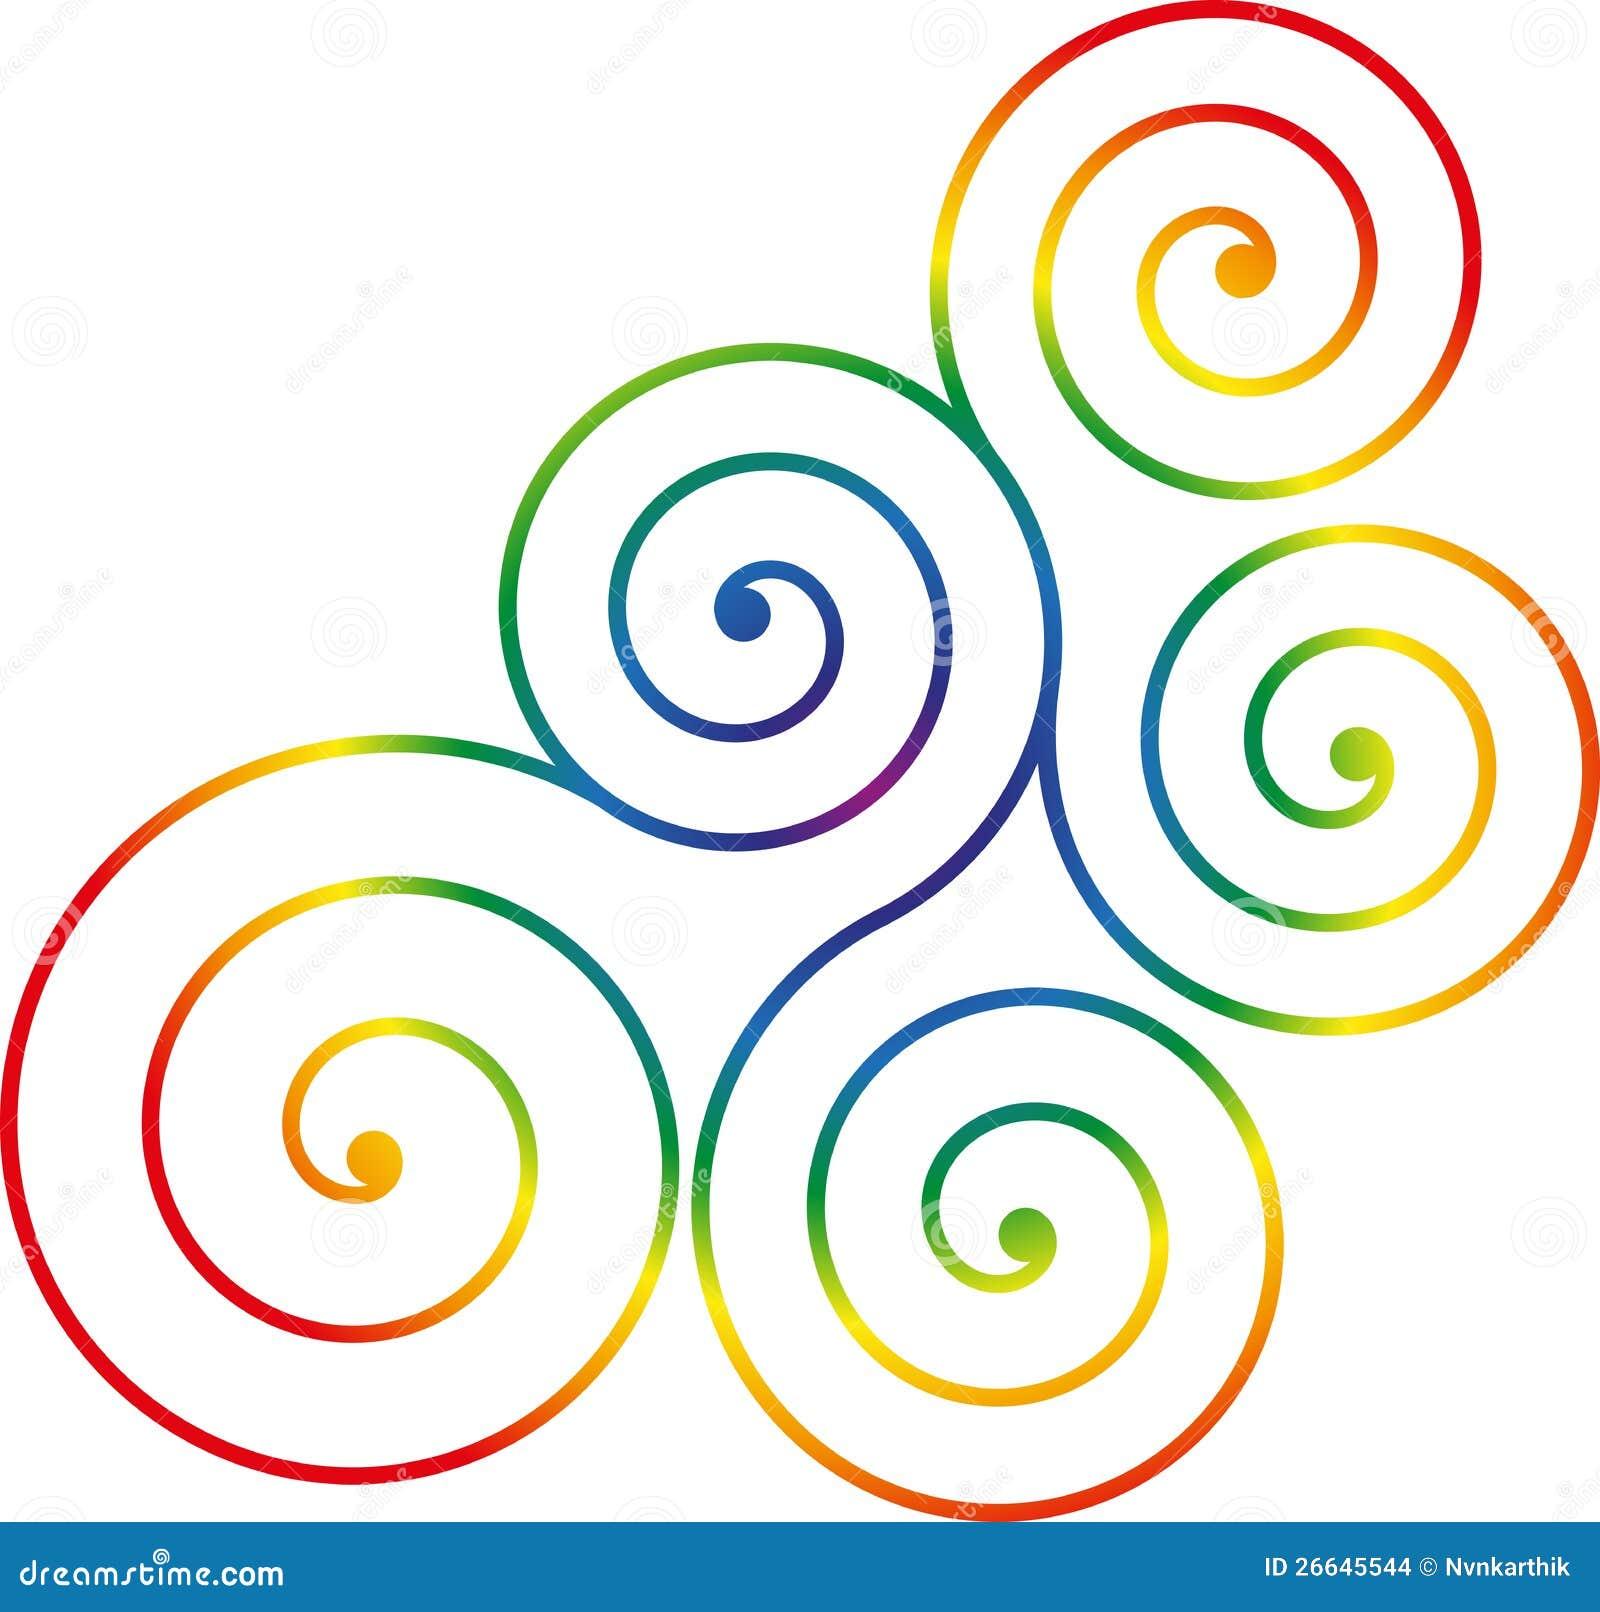 Color Line Design : Swirl design stock vector illustration of carving curls